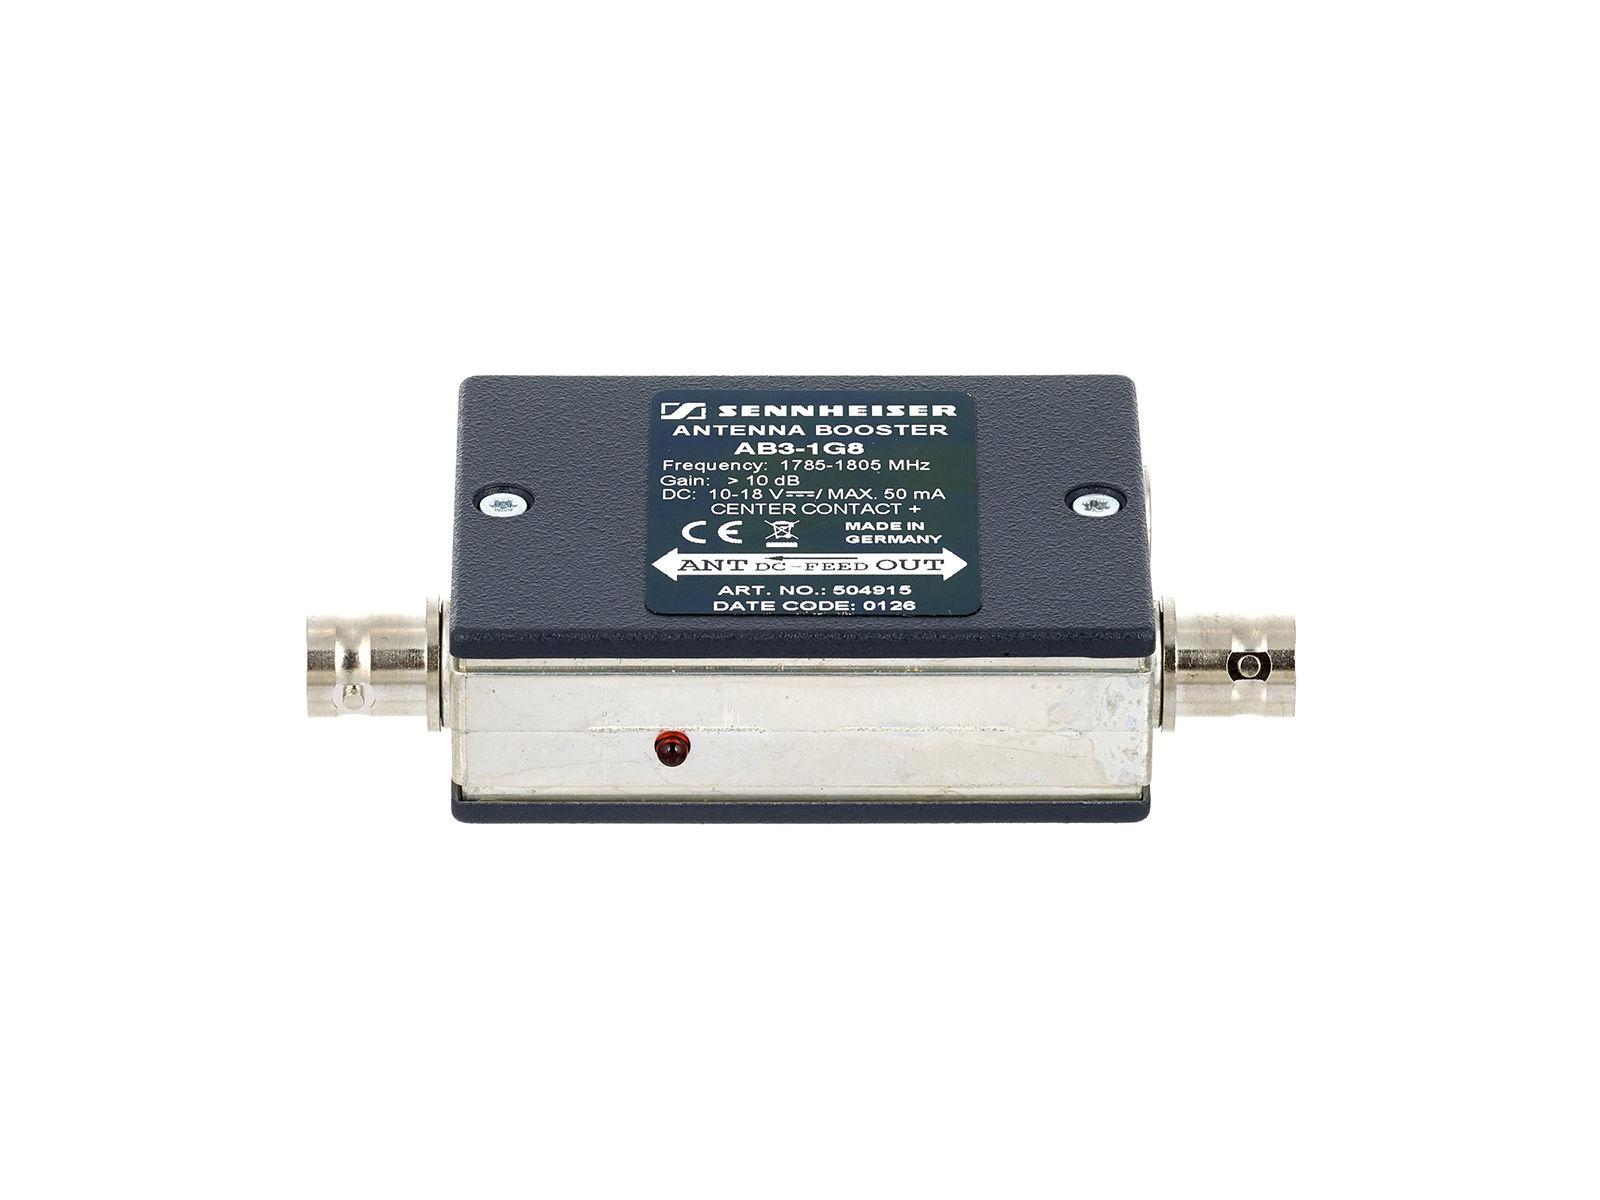 Sennheiser AB 3-1G8 | Antennenbooster, 10dB Verstärkung, 1785 - 1800 MHz,